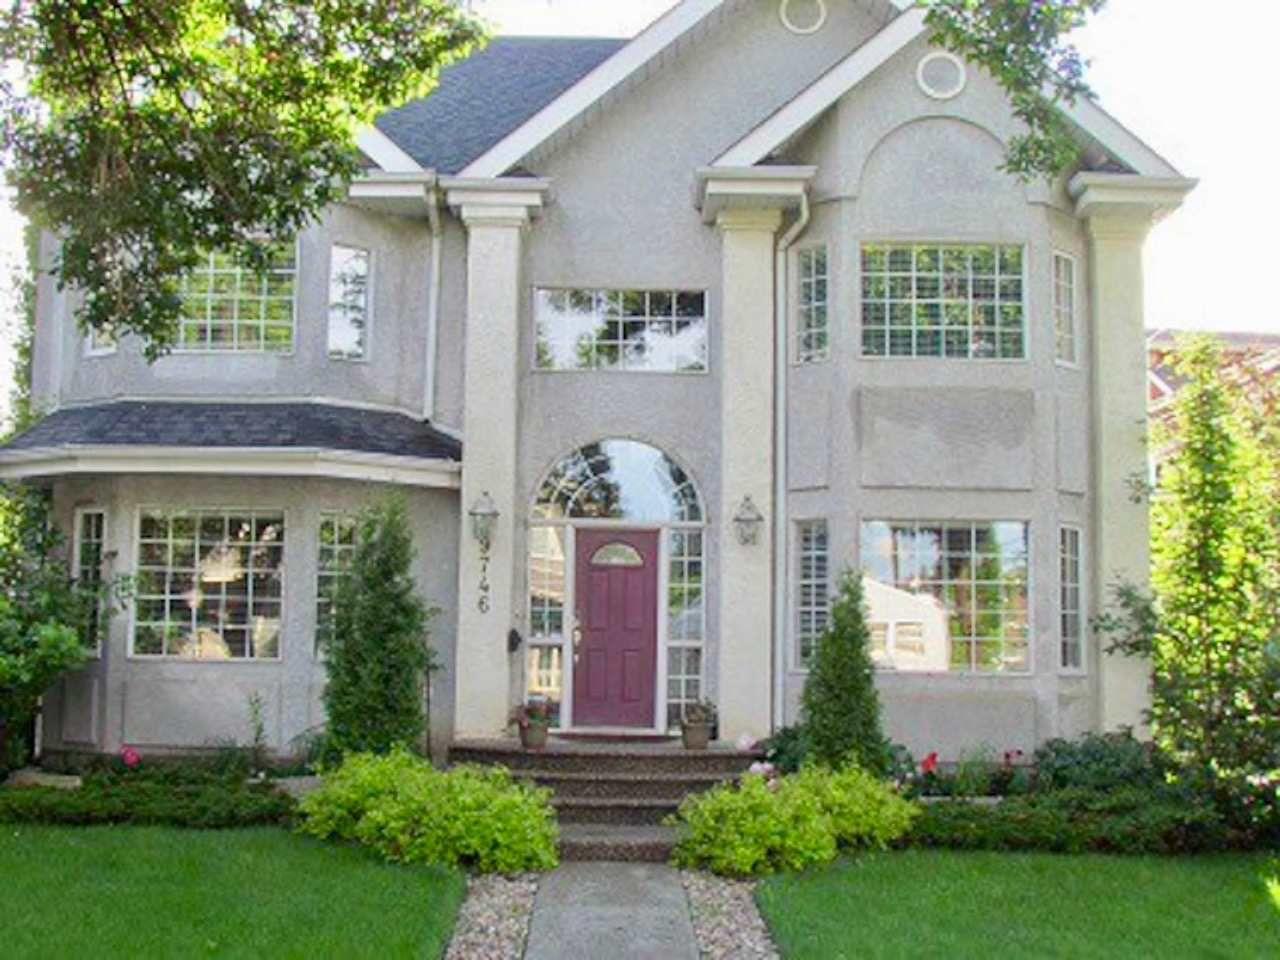 Main Photo: 9746 94 Street in Edmonton: Zone 18 House for sale : MLS®# E4151514